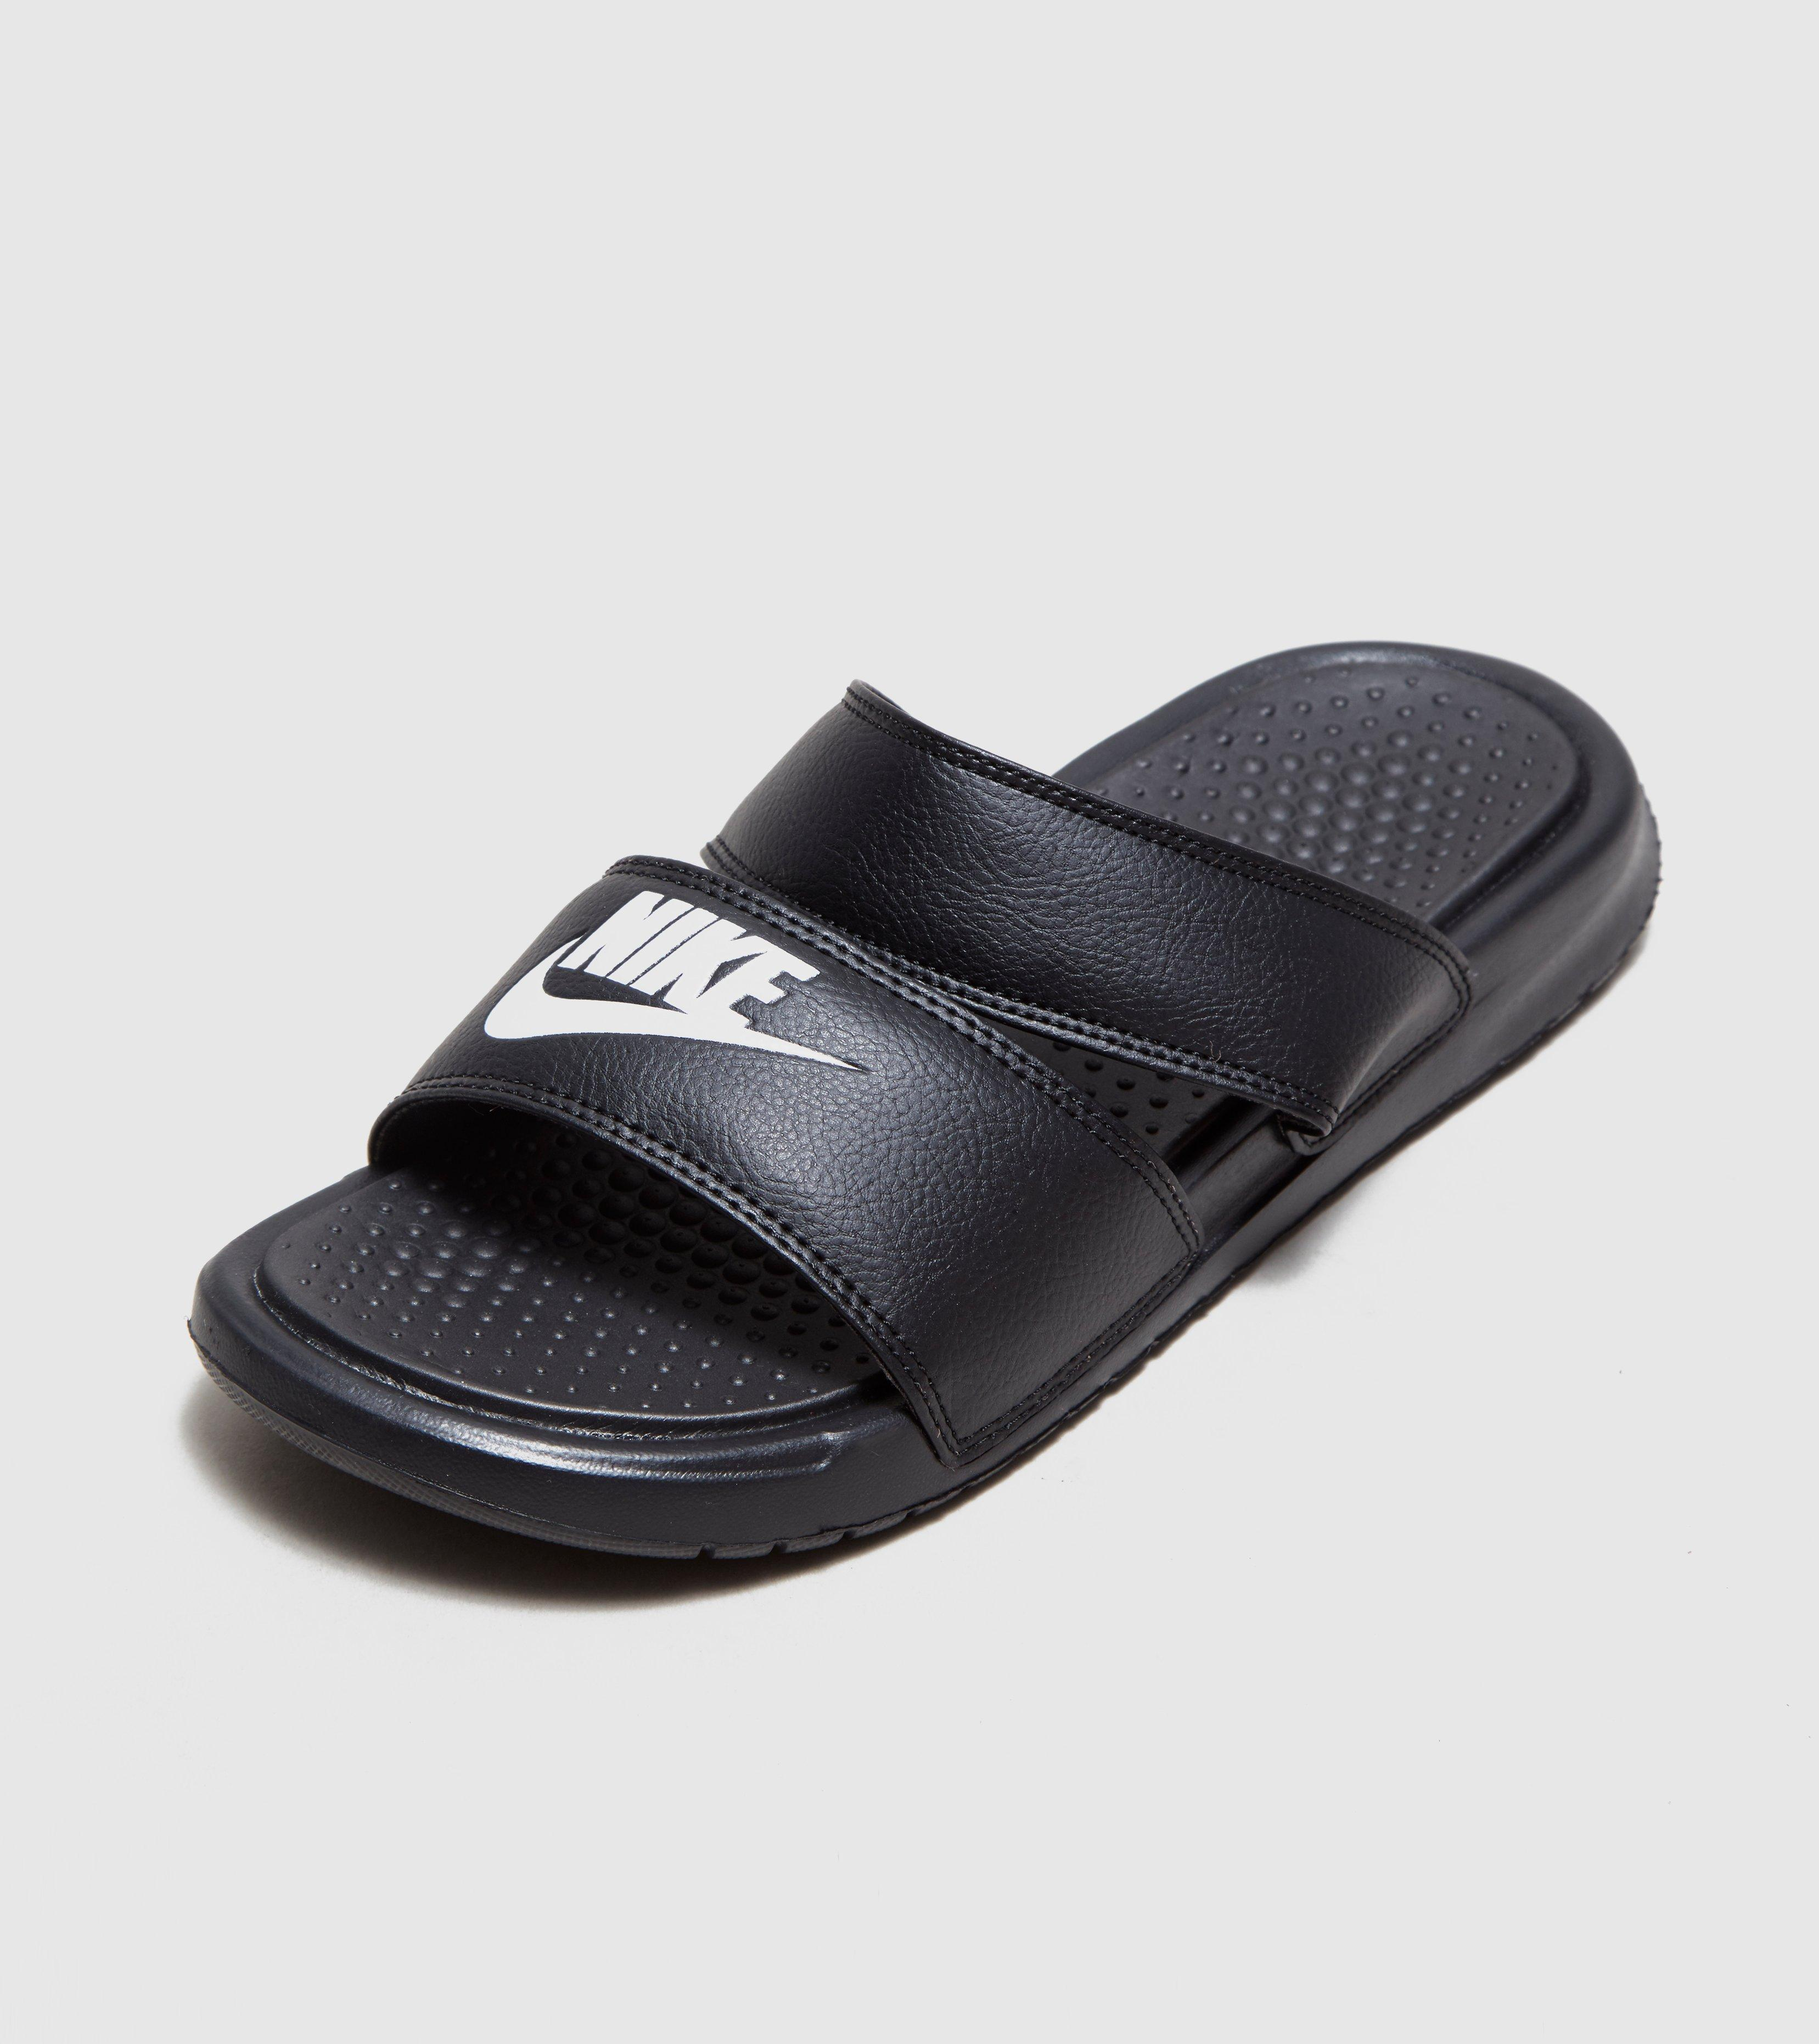 running shop new shoes comfort balance brands thong black cloud nike walking a comforter on